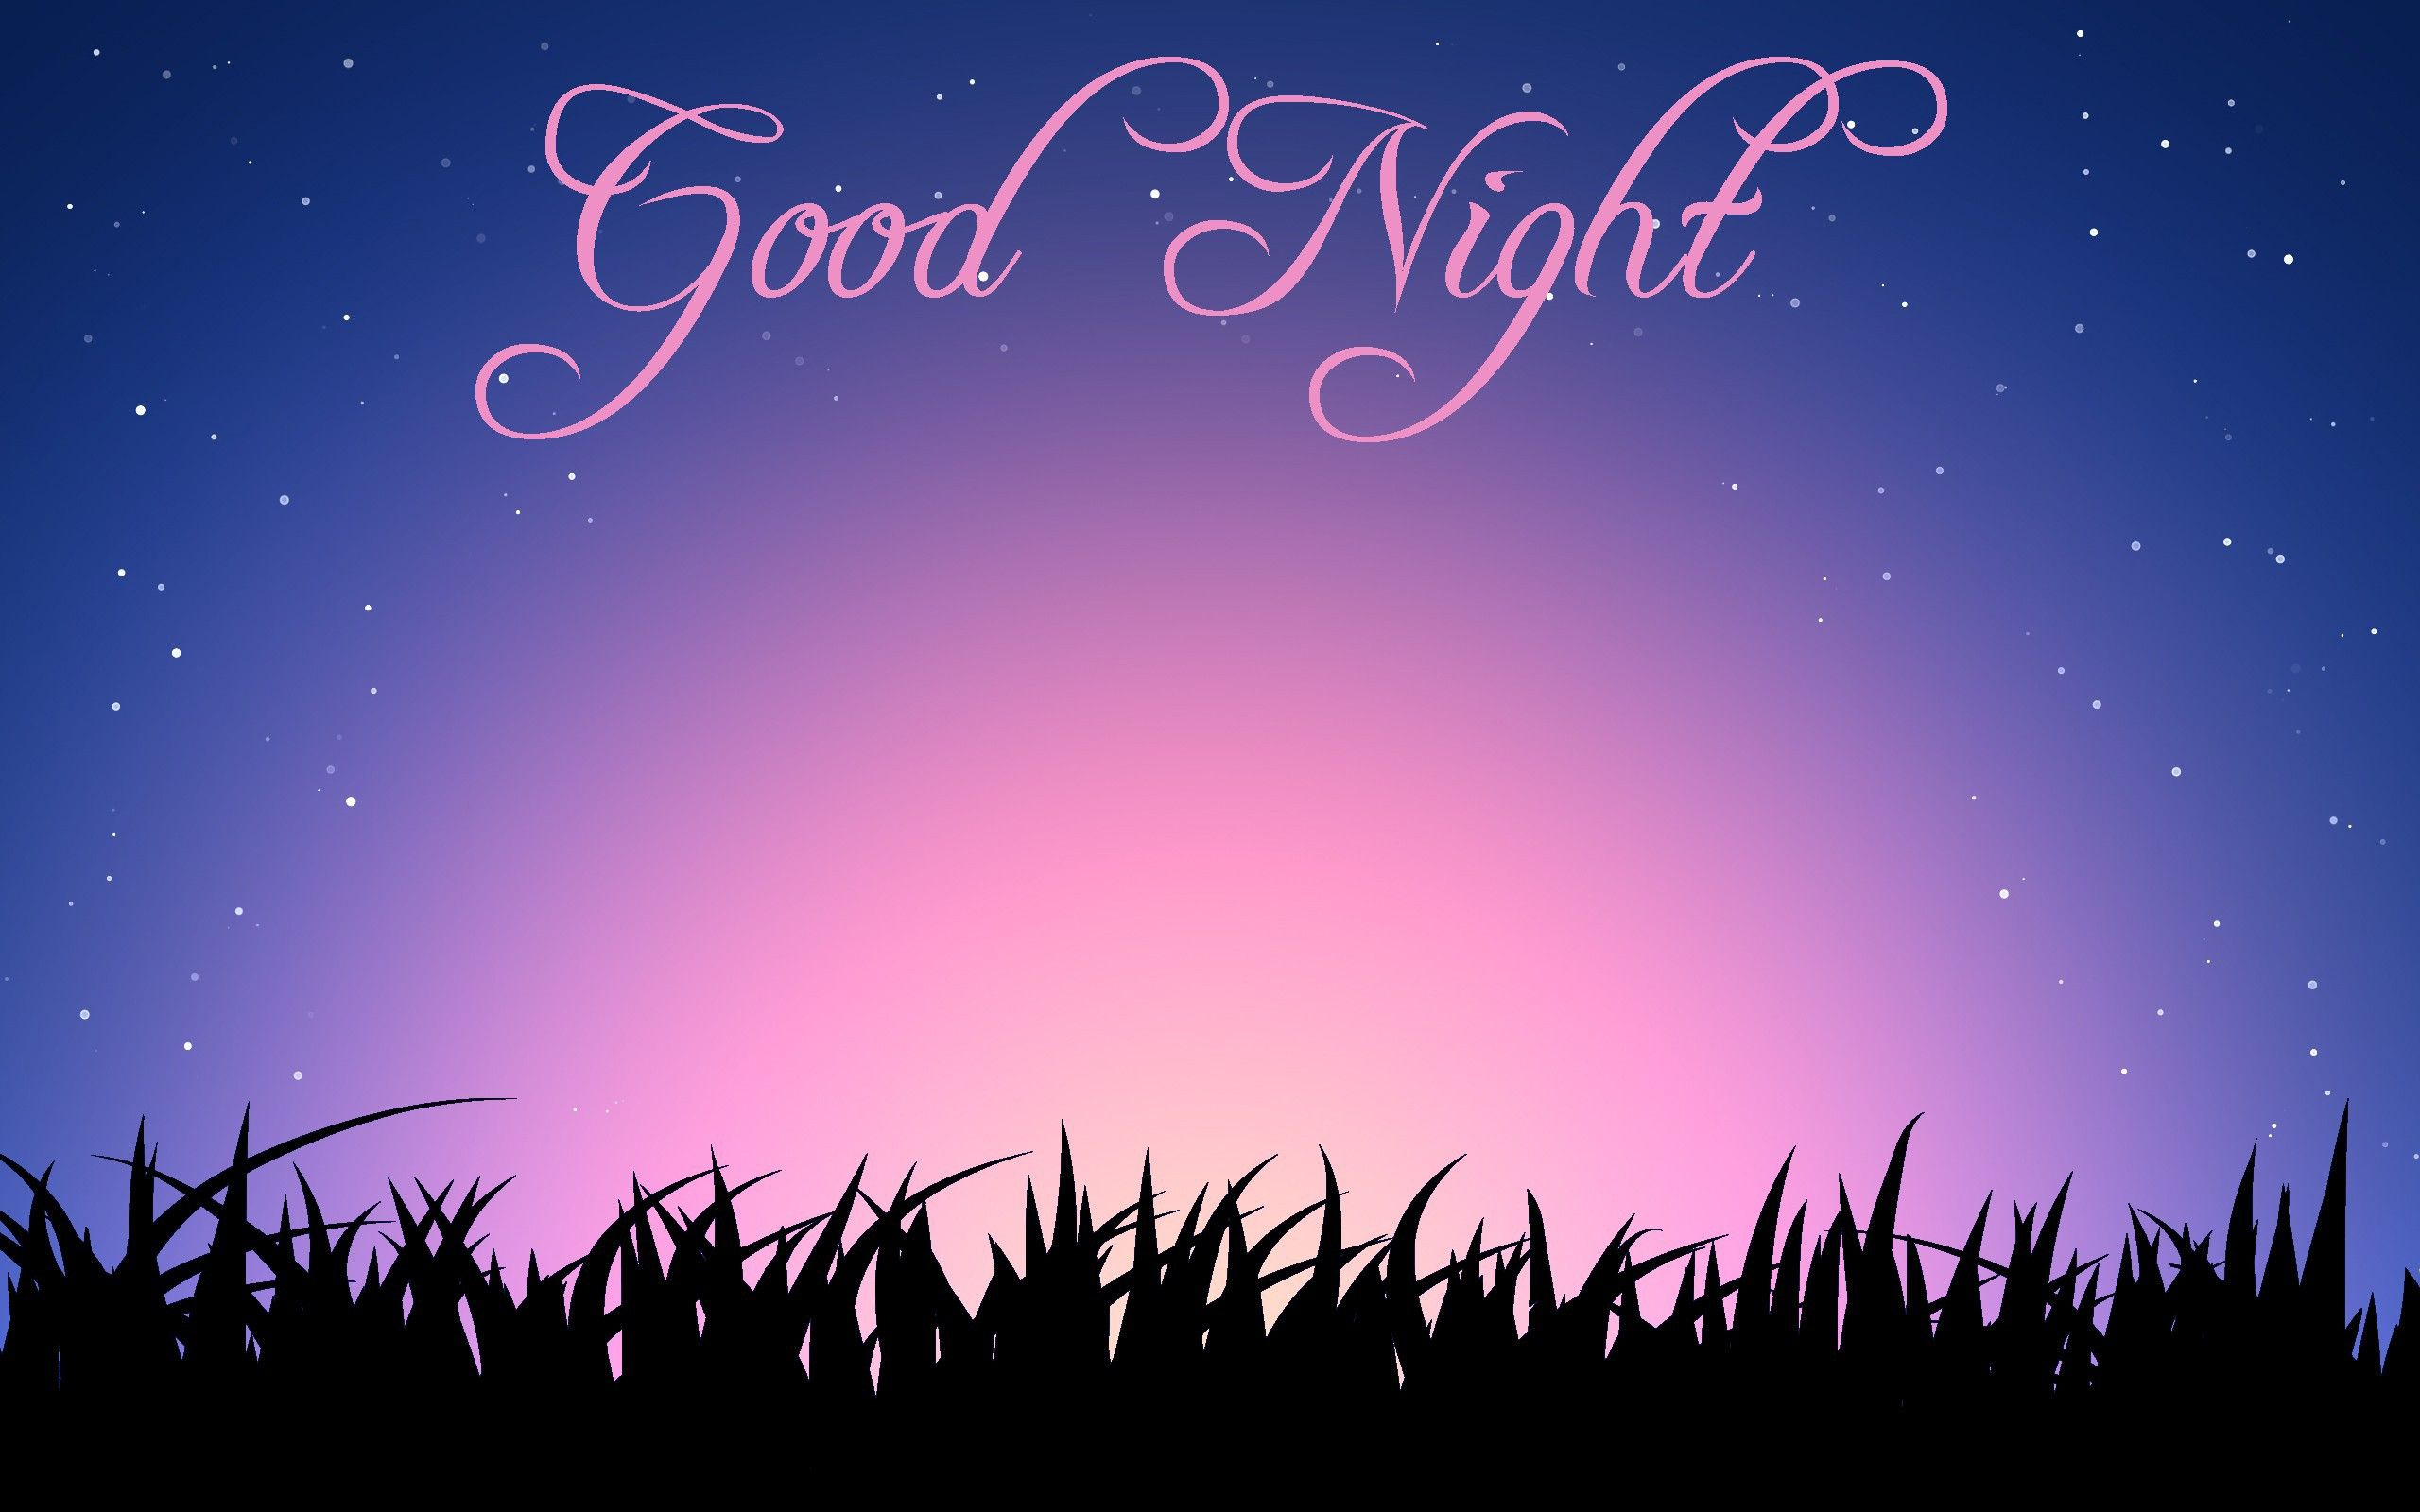 Hd wallpaper for whatsapp - Free New Good Night Desktop Hd Wallpapers Whatsapp Download